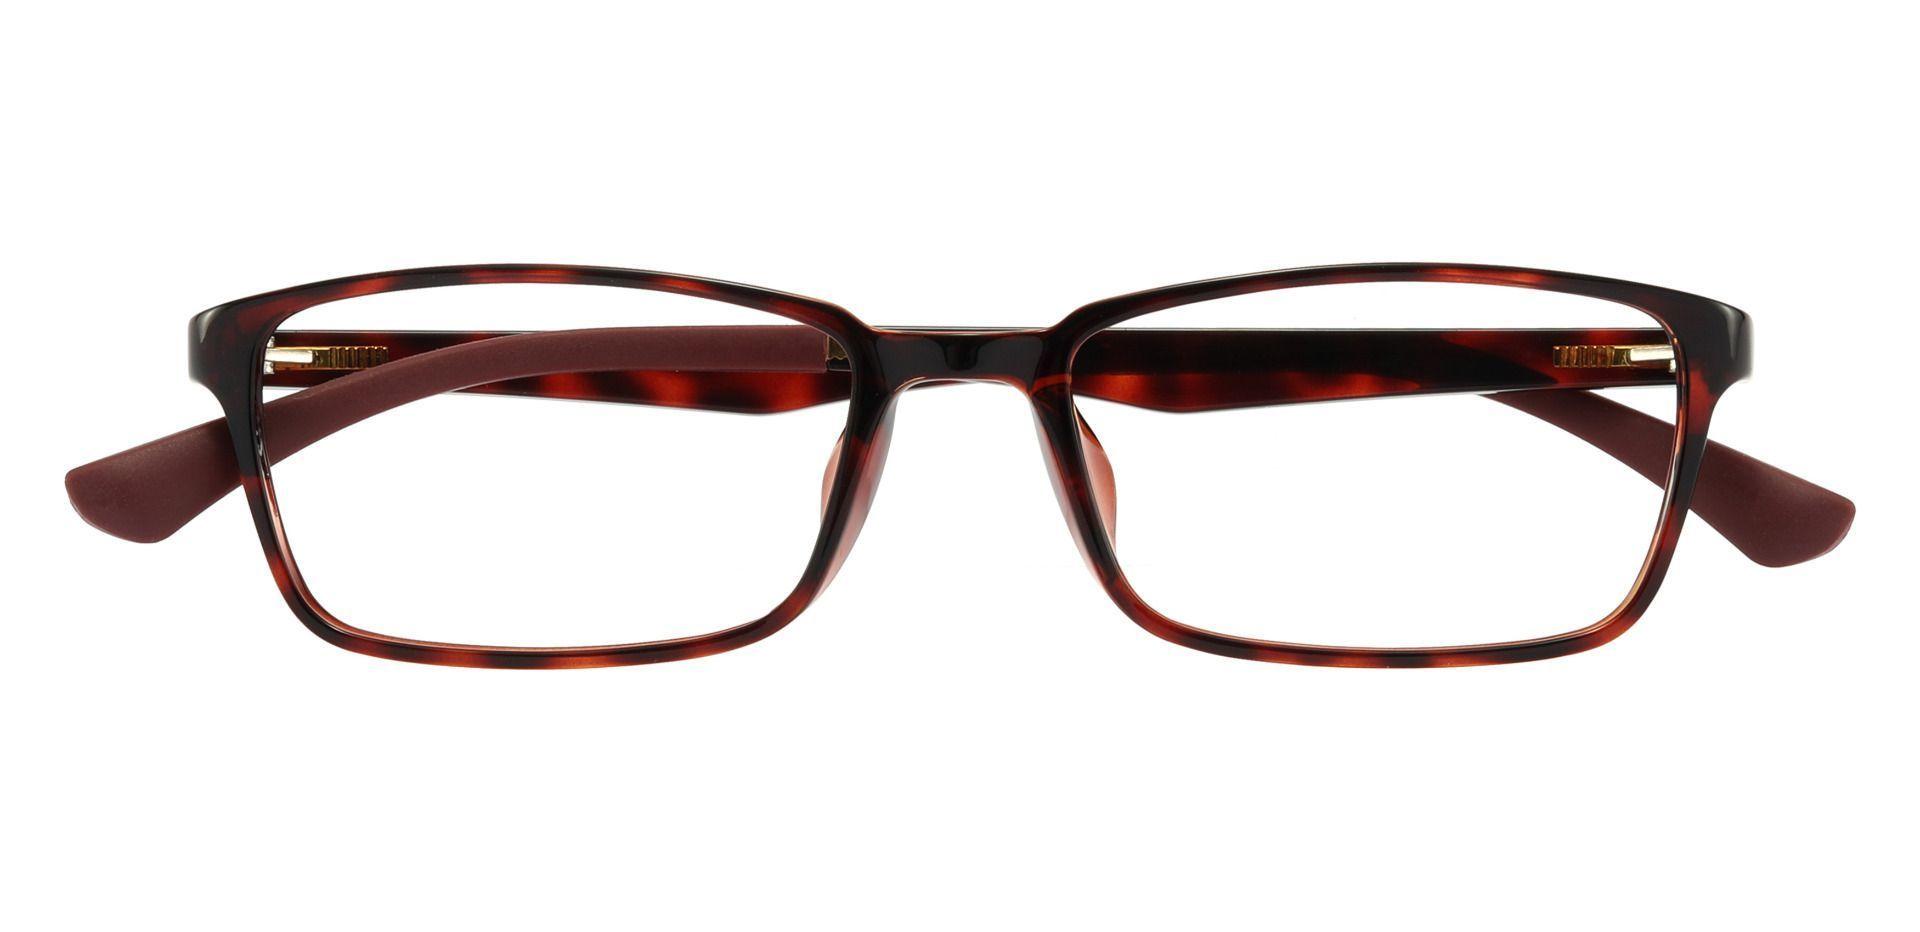 Ripley Rectangle Prescription Glasses - Tortoise